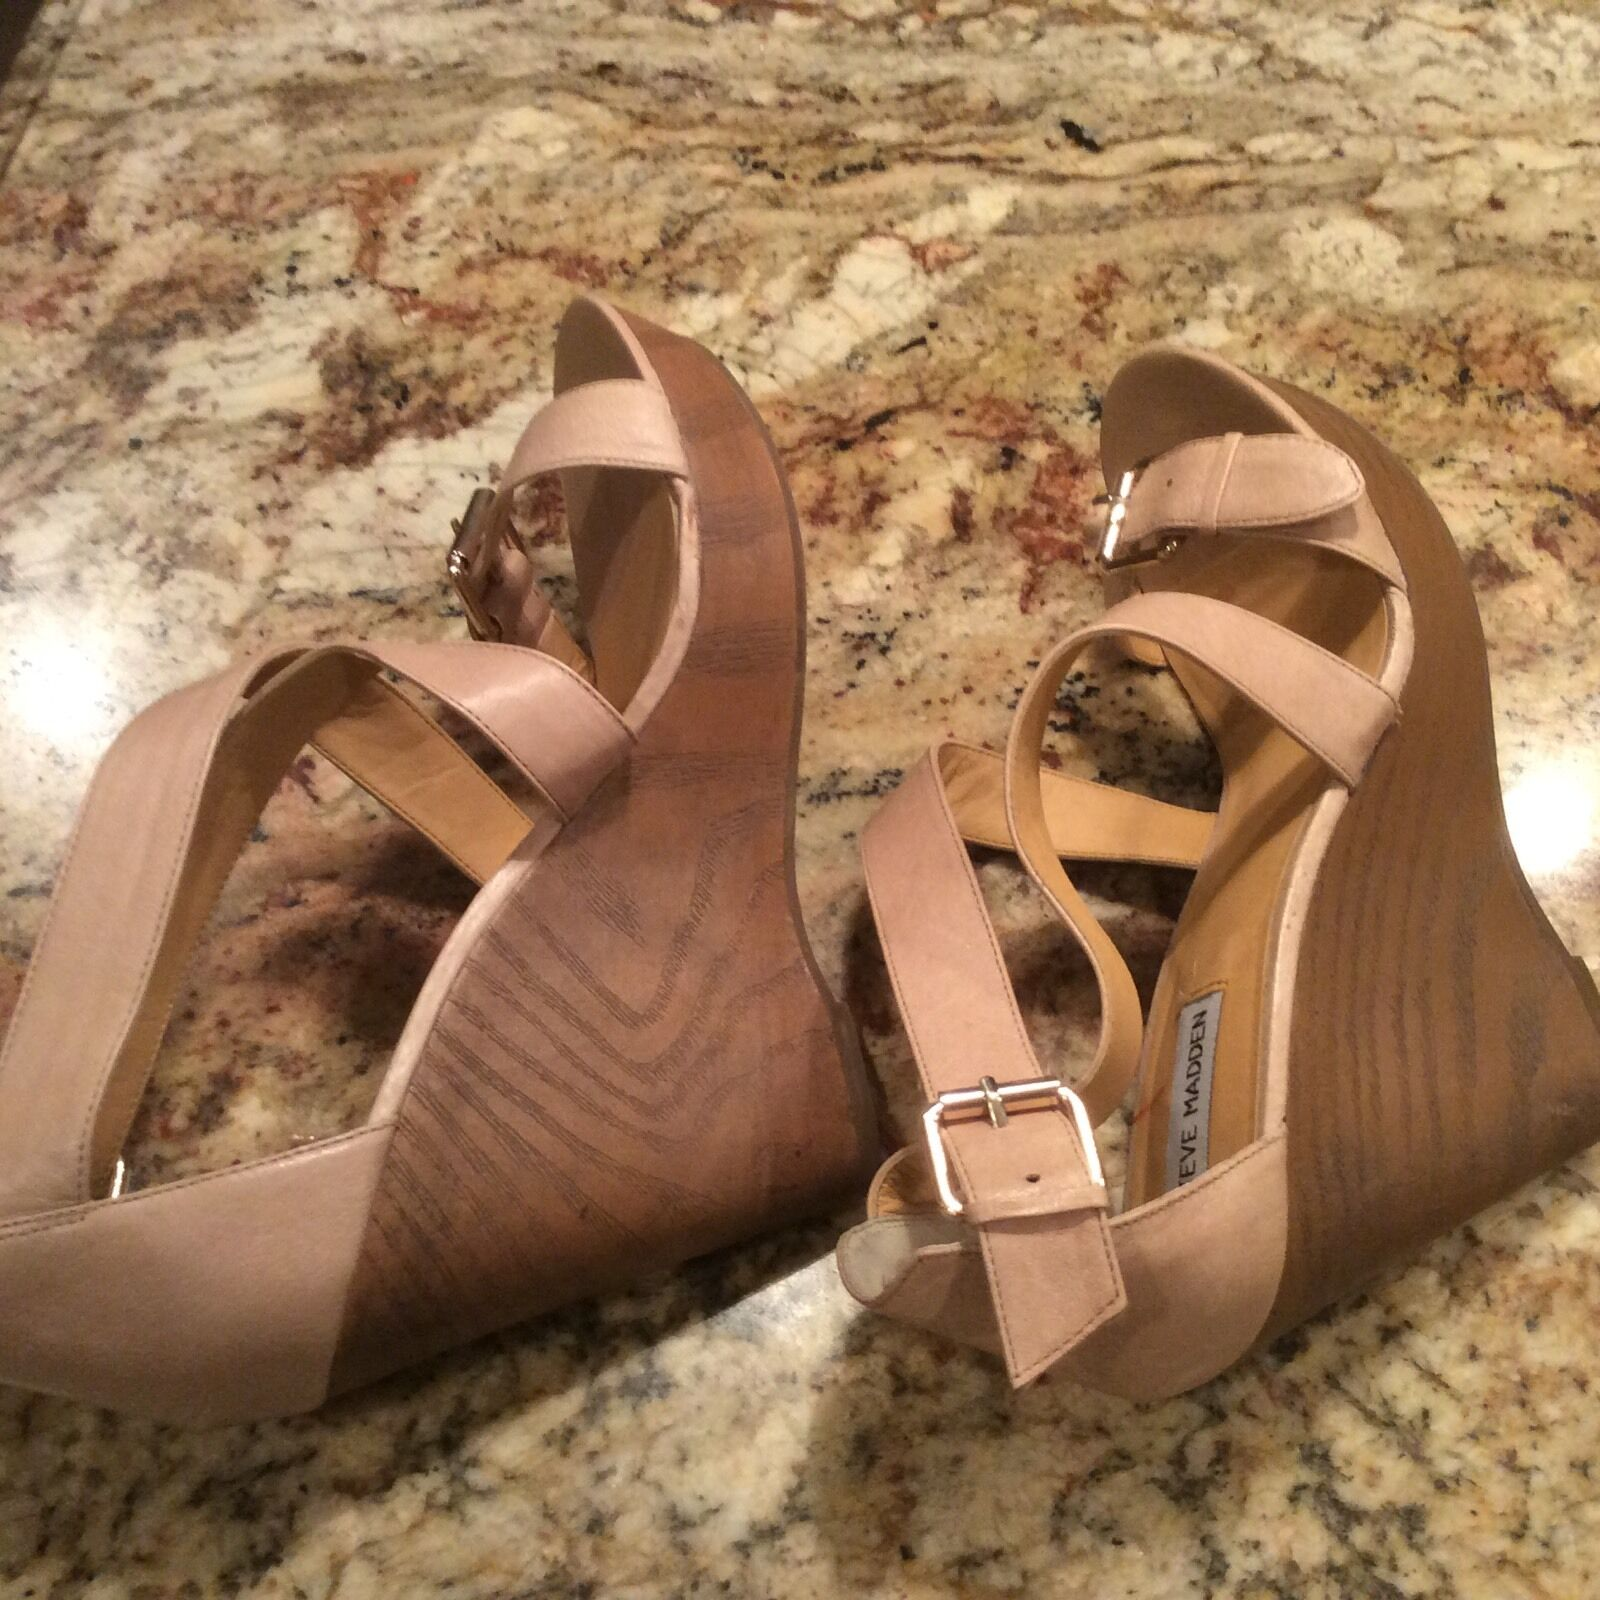 Steve Madden Myrna Myrna Myrna damen Beige Nude Leather Platform Wedges Sandals schuhe 11 3abaf9